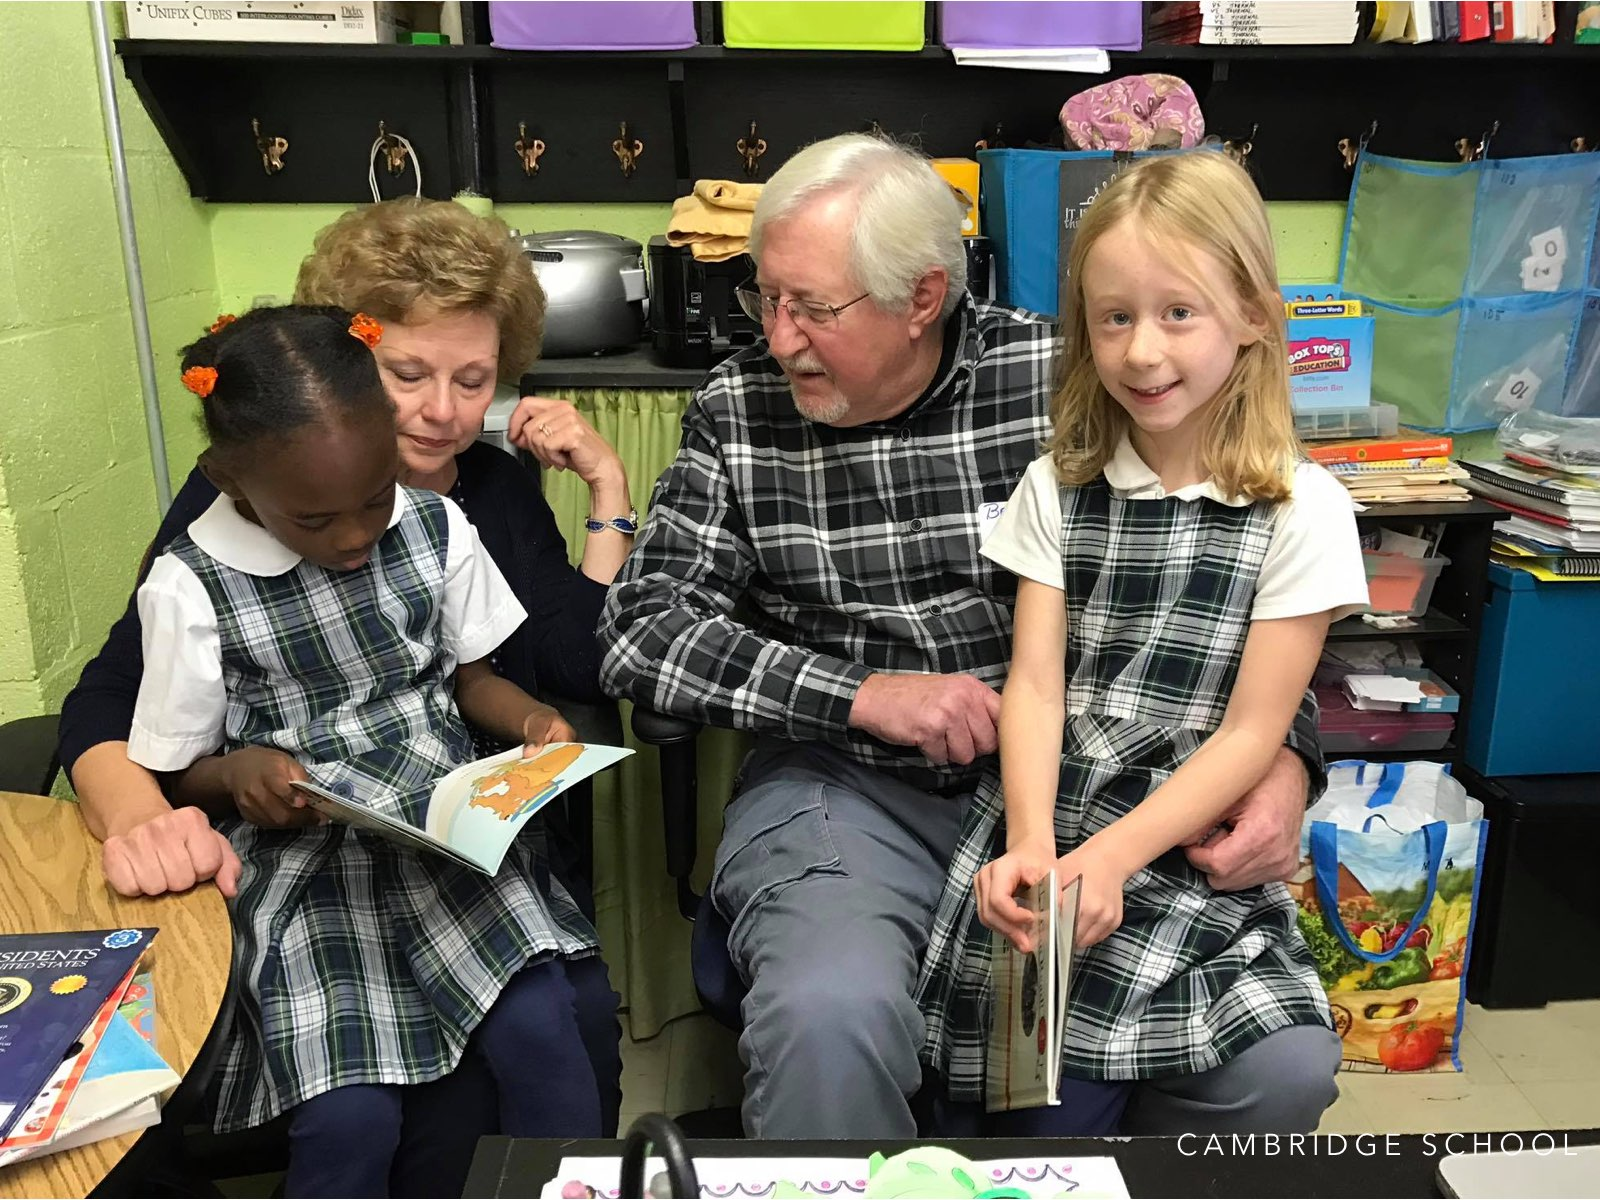 s(cool) stories: cambridge school - (cool) progeny